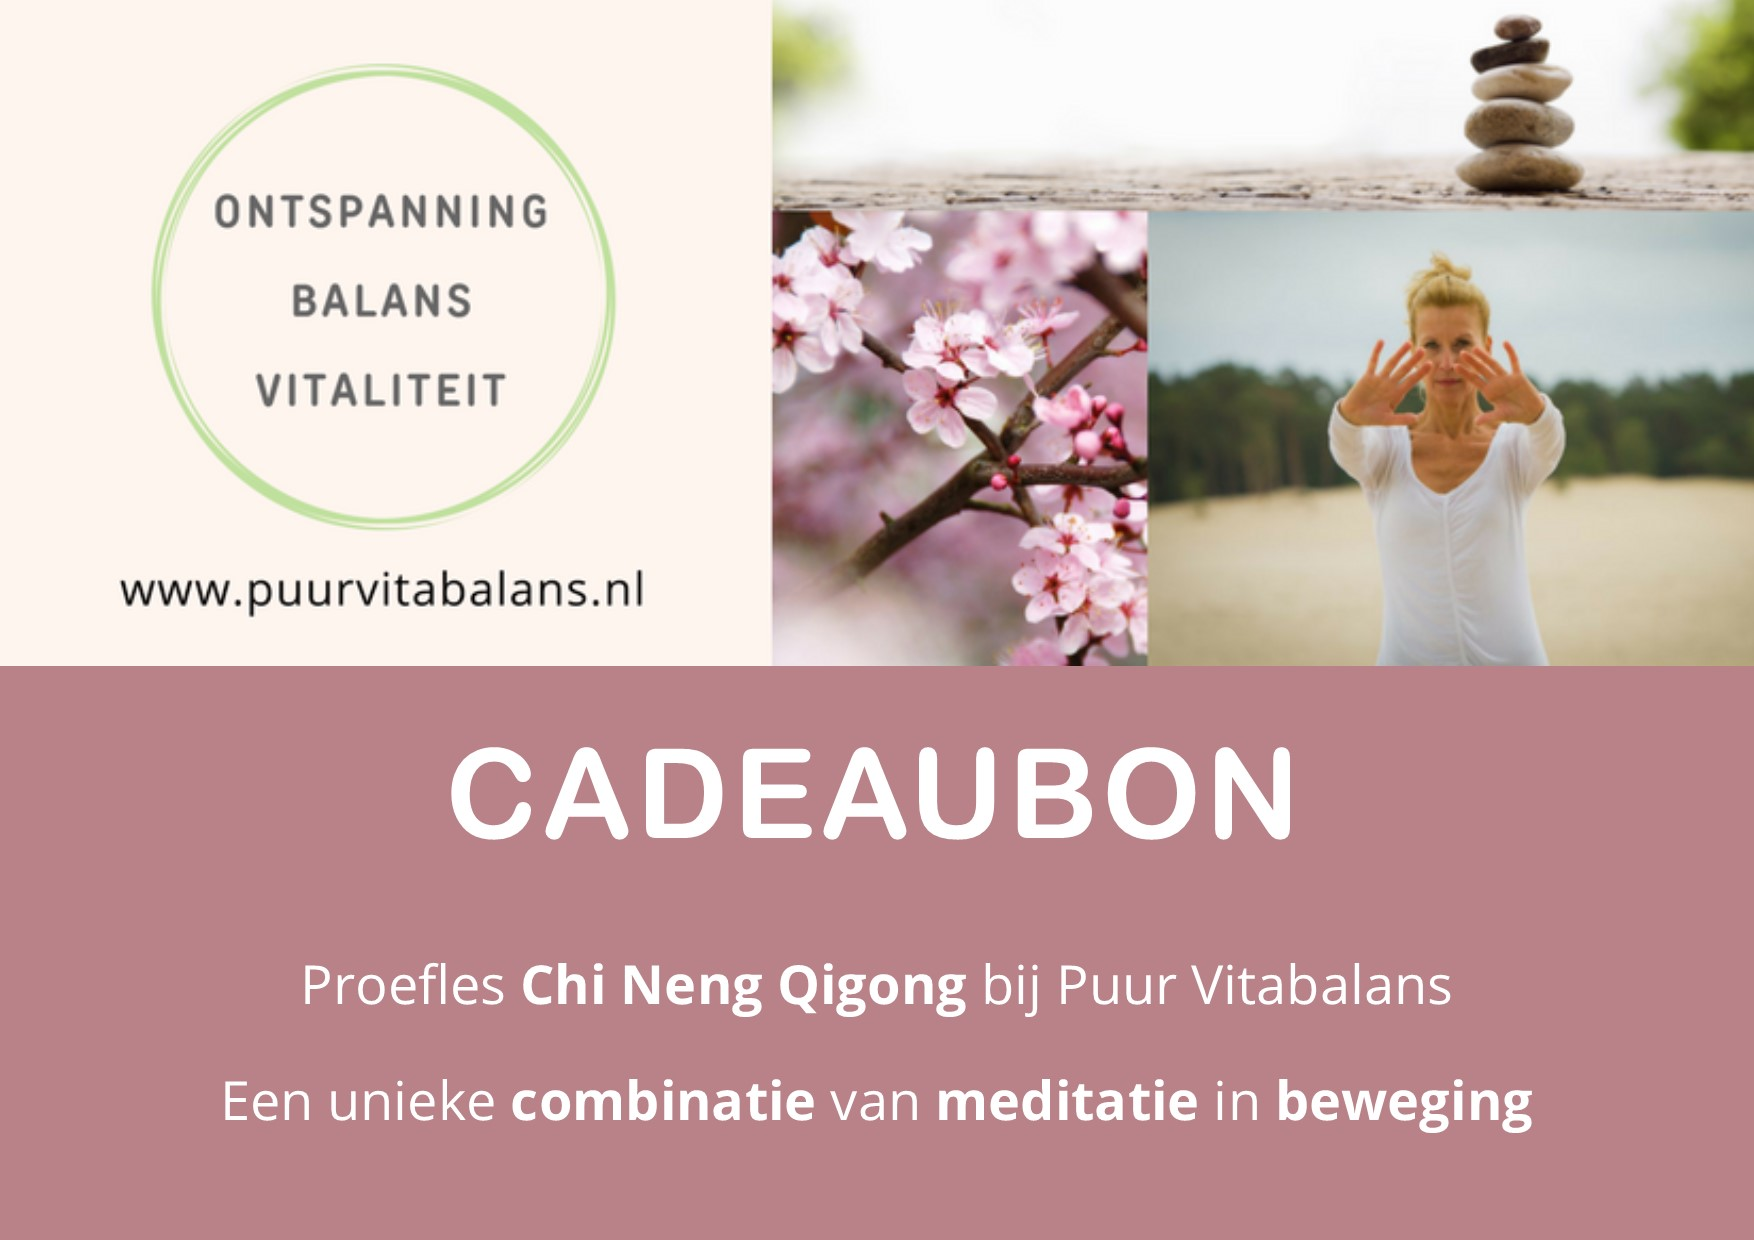 Puurvitabalans.nl HHL